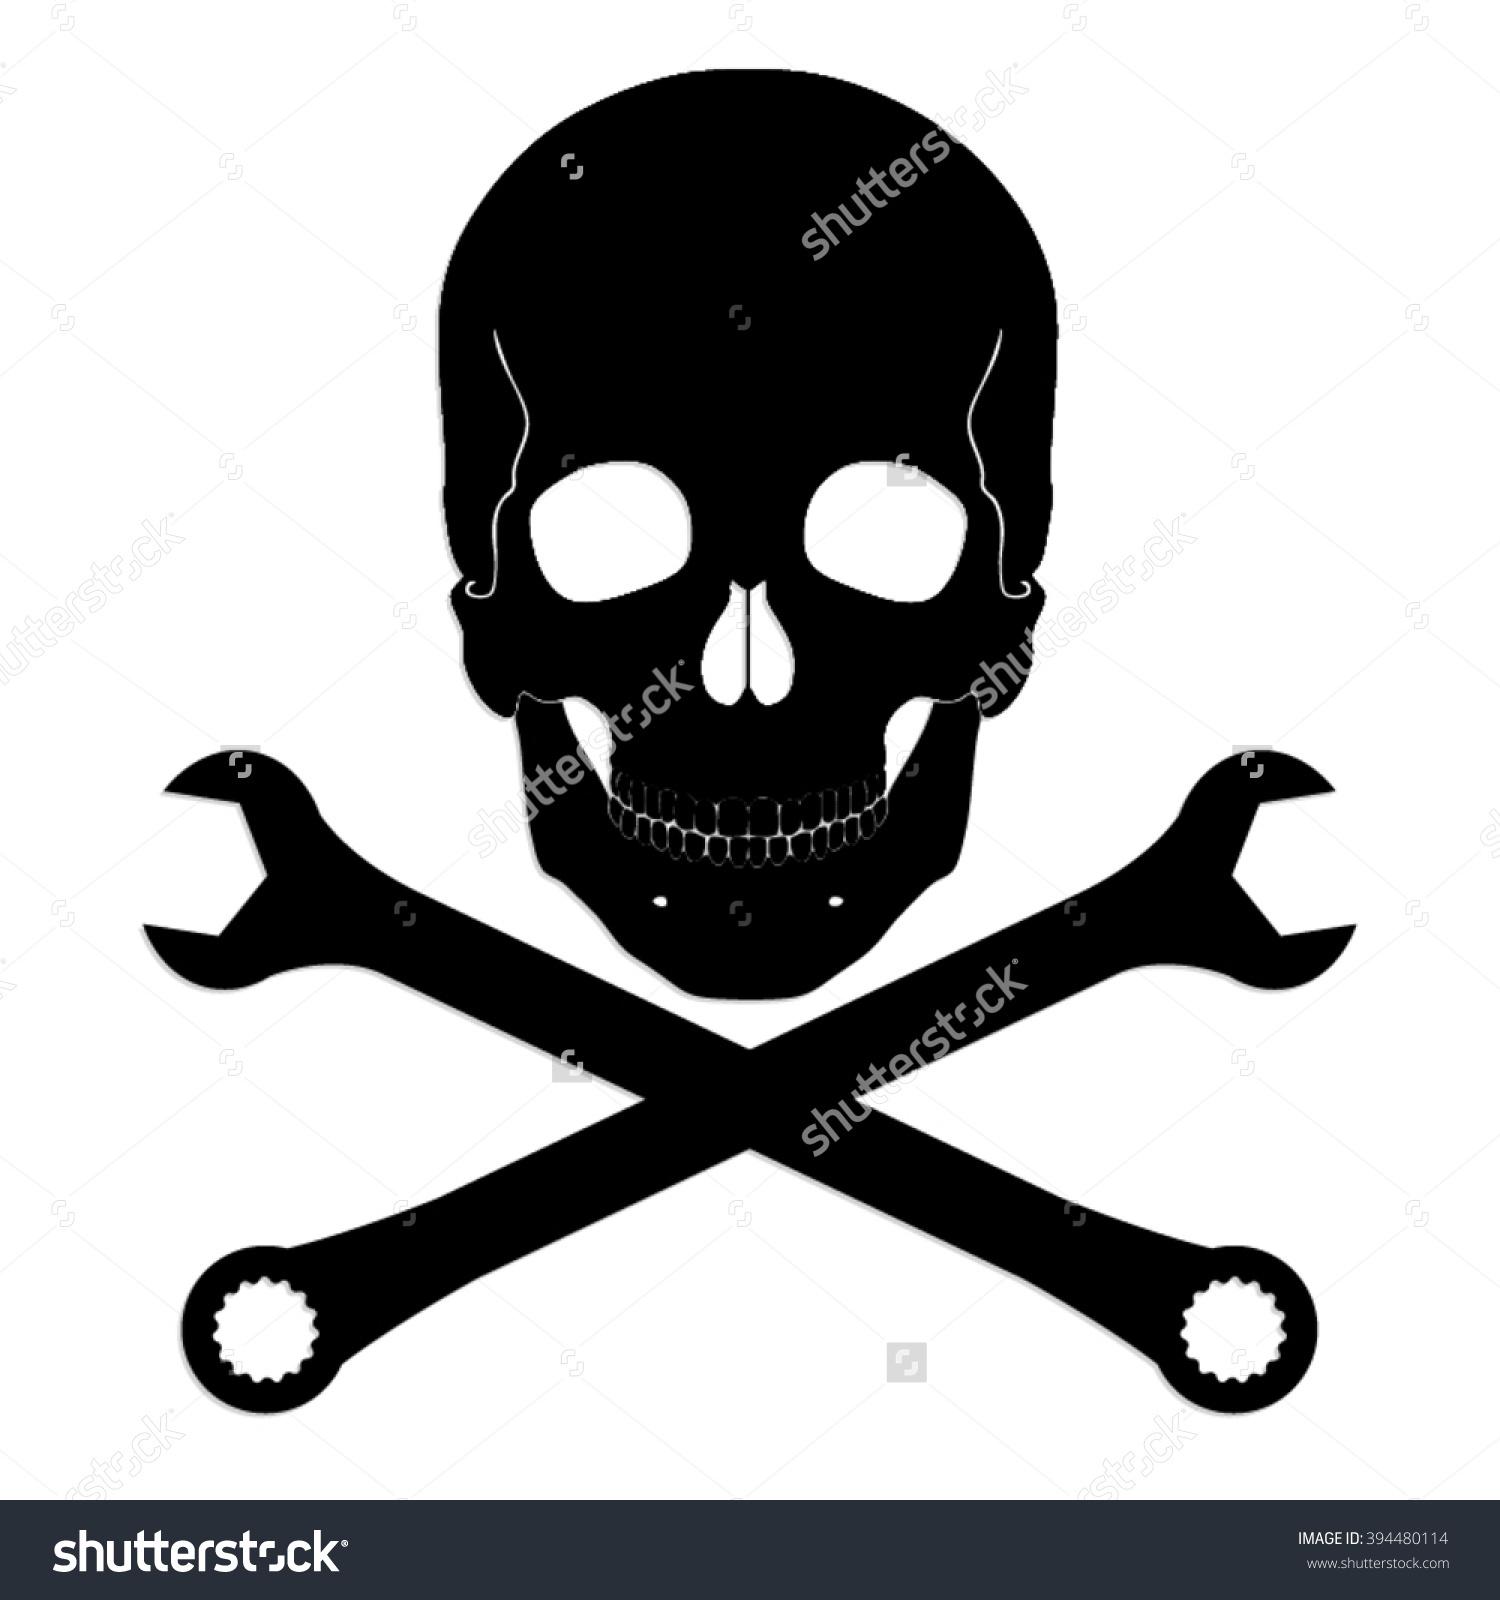 Silhouette Skull Crossed Wrench Vector Symbol Stock Vector.